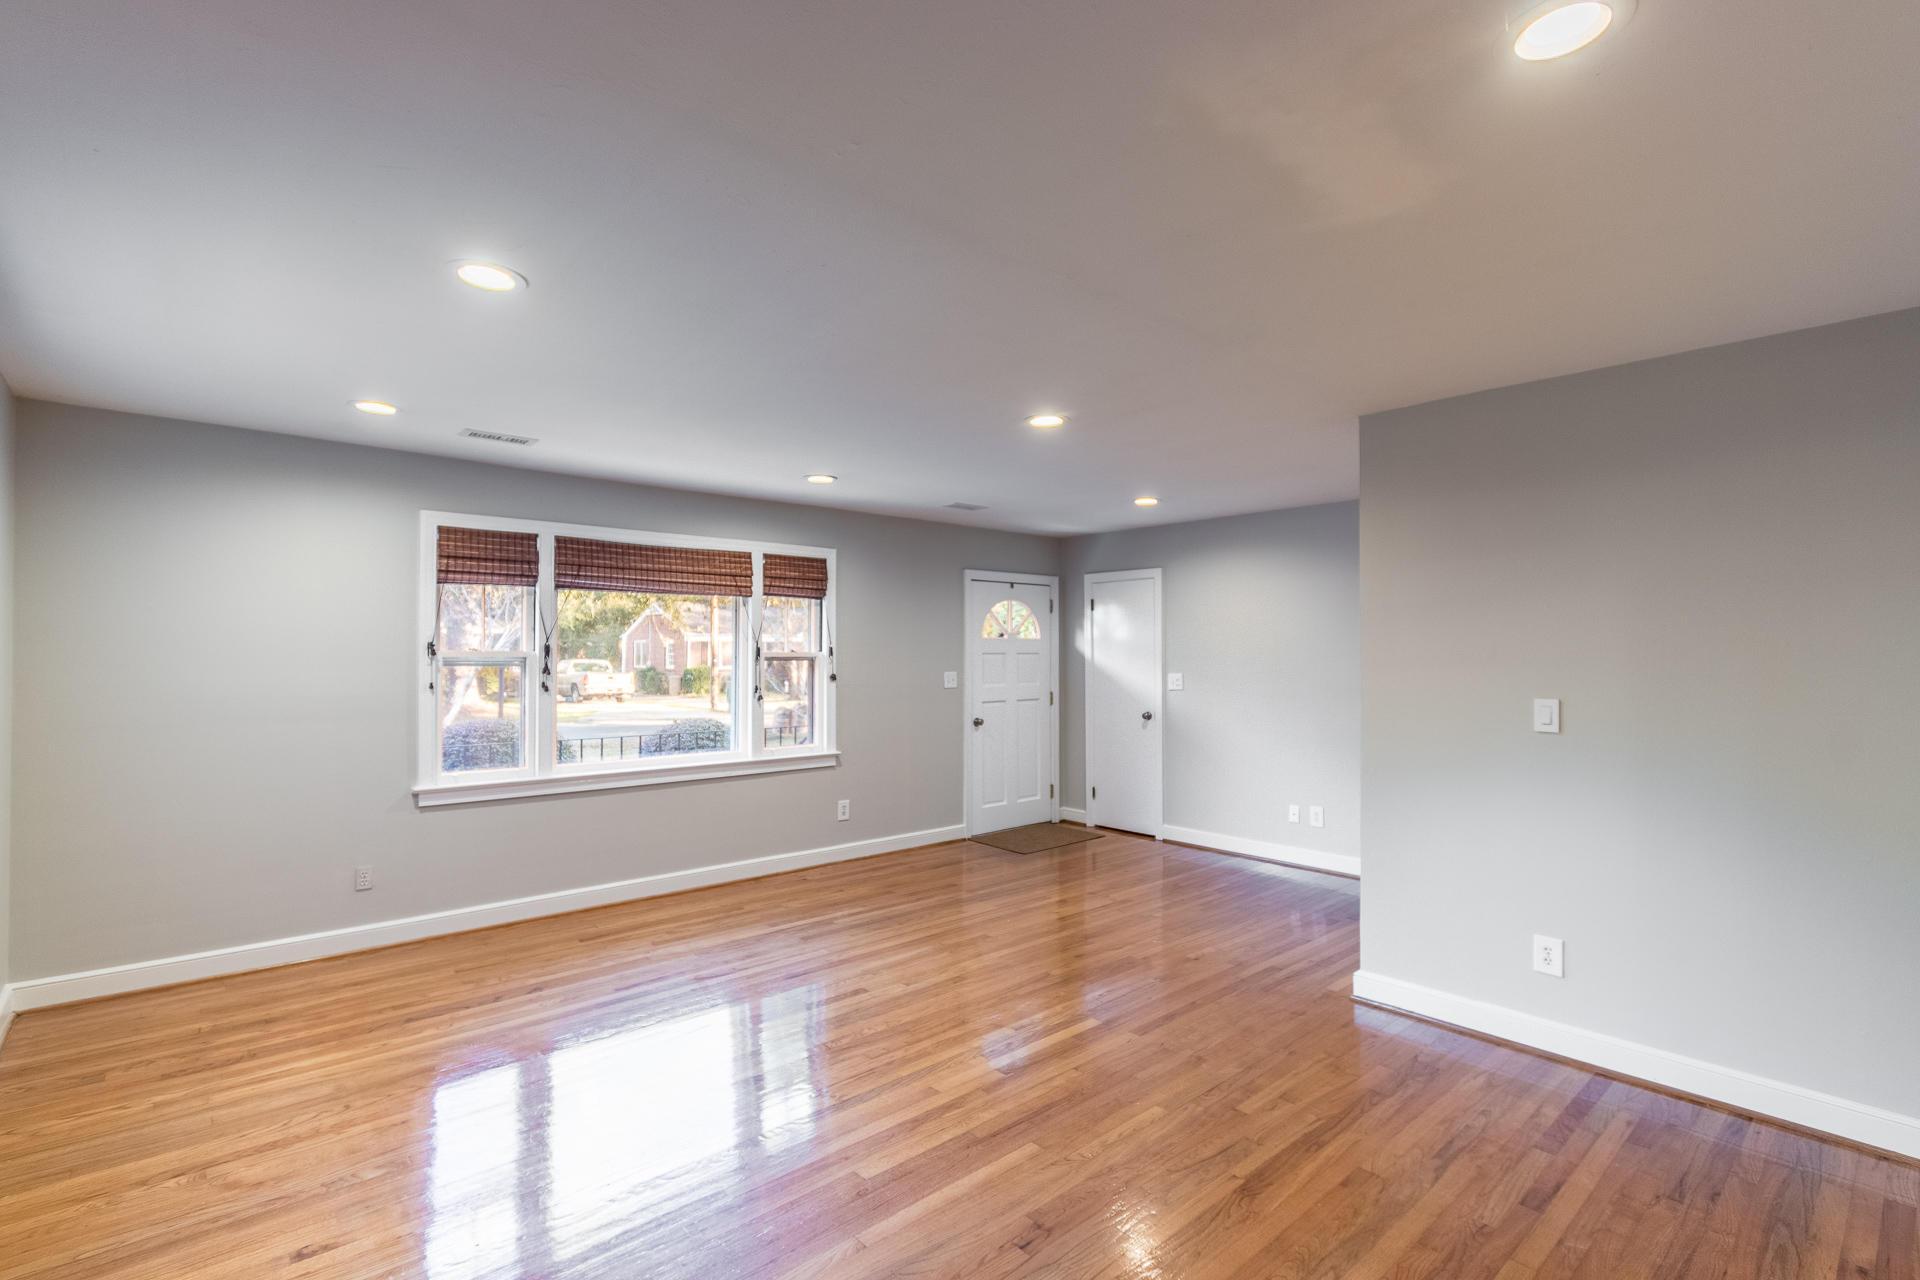 Edgewood Gardens Homes For Sale - 507 Risher, Charleston, SC - 13